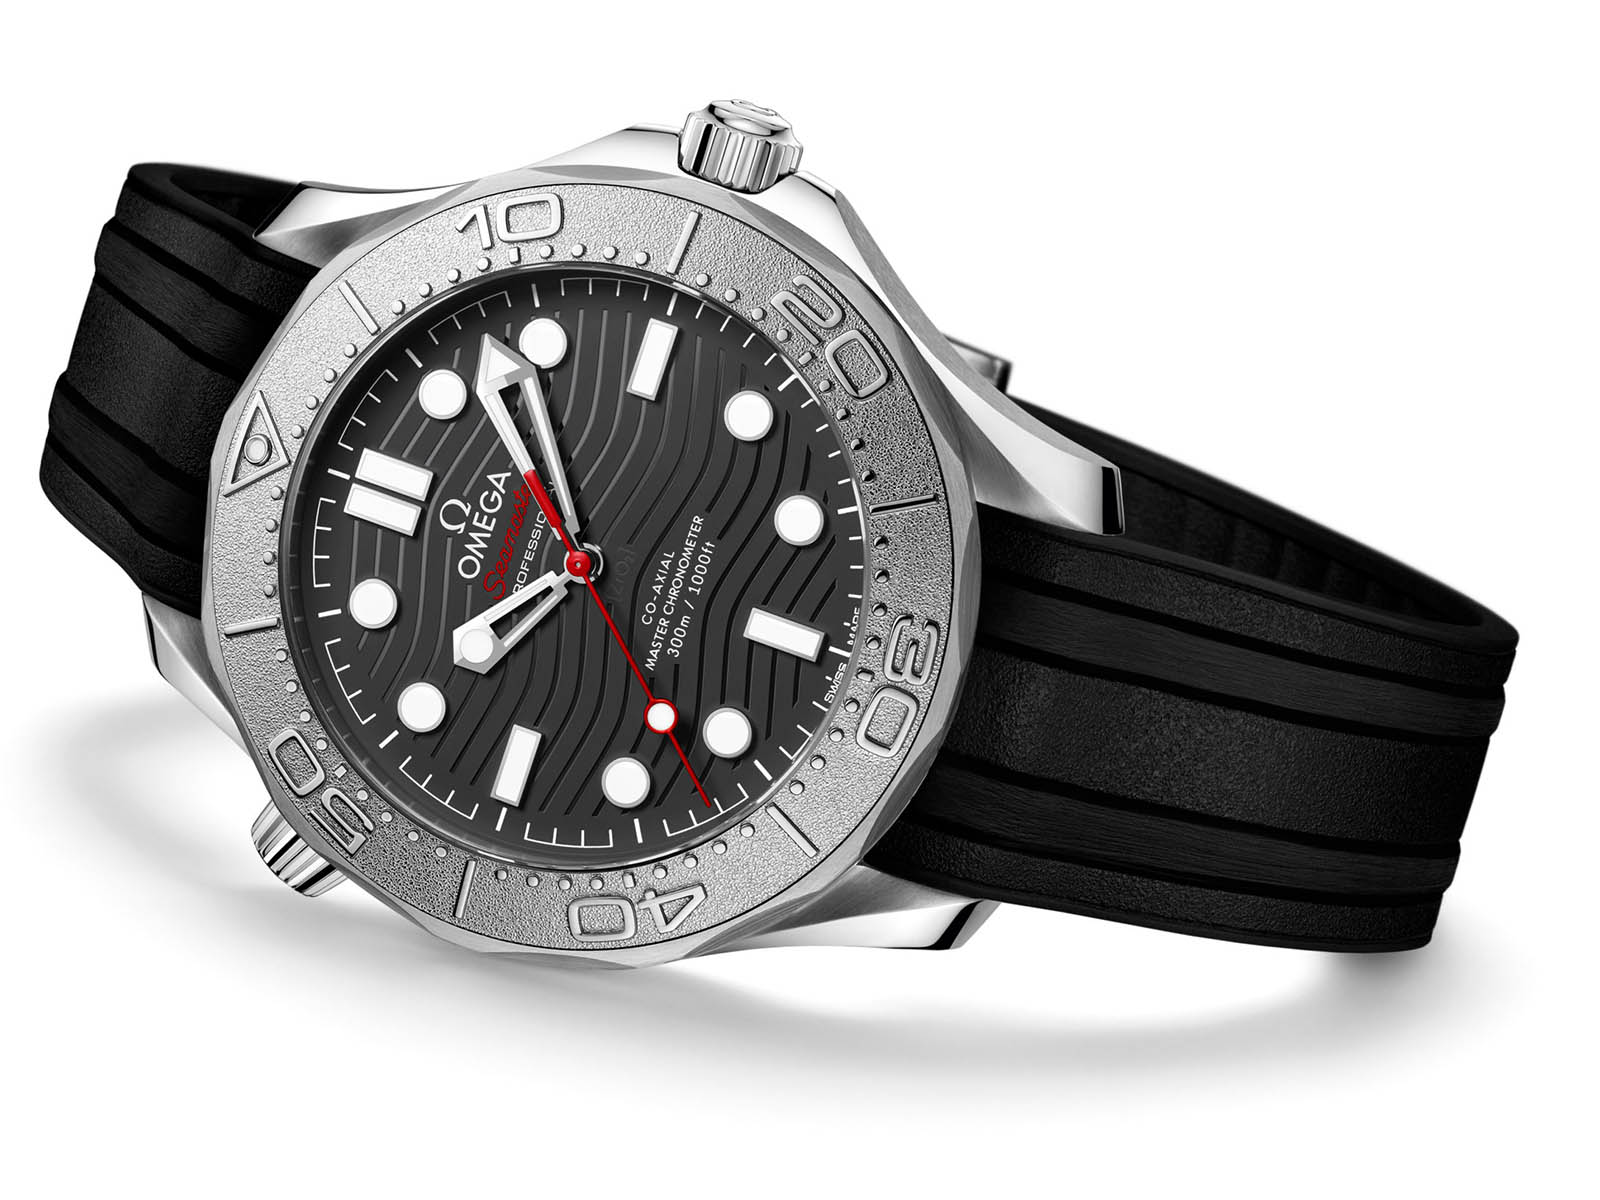 210-32-42-20-01-002-omega-seamaster-diver-300m-nekton-edition-3.jpg